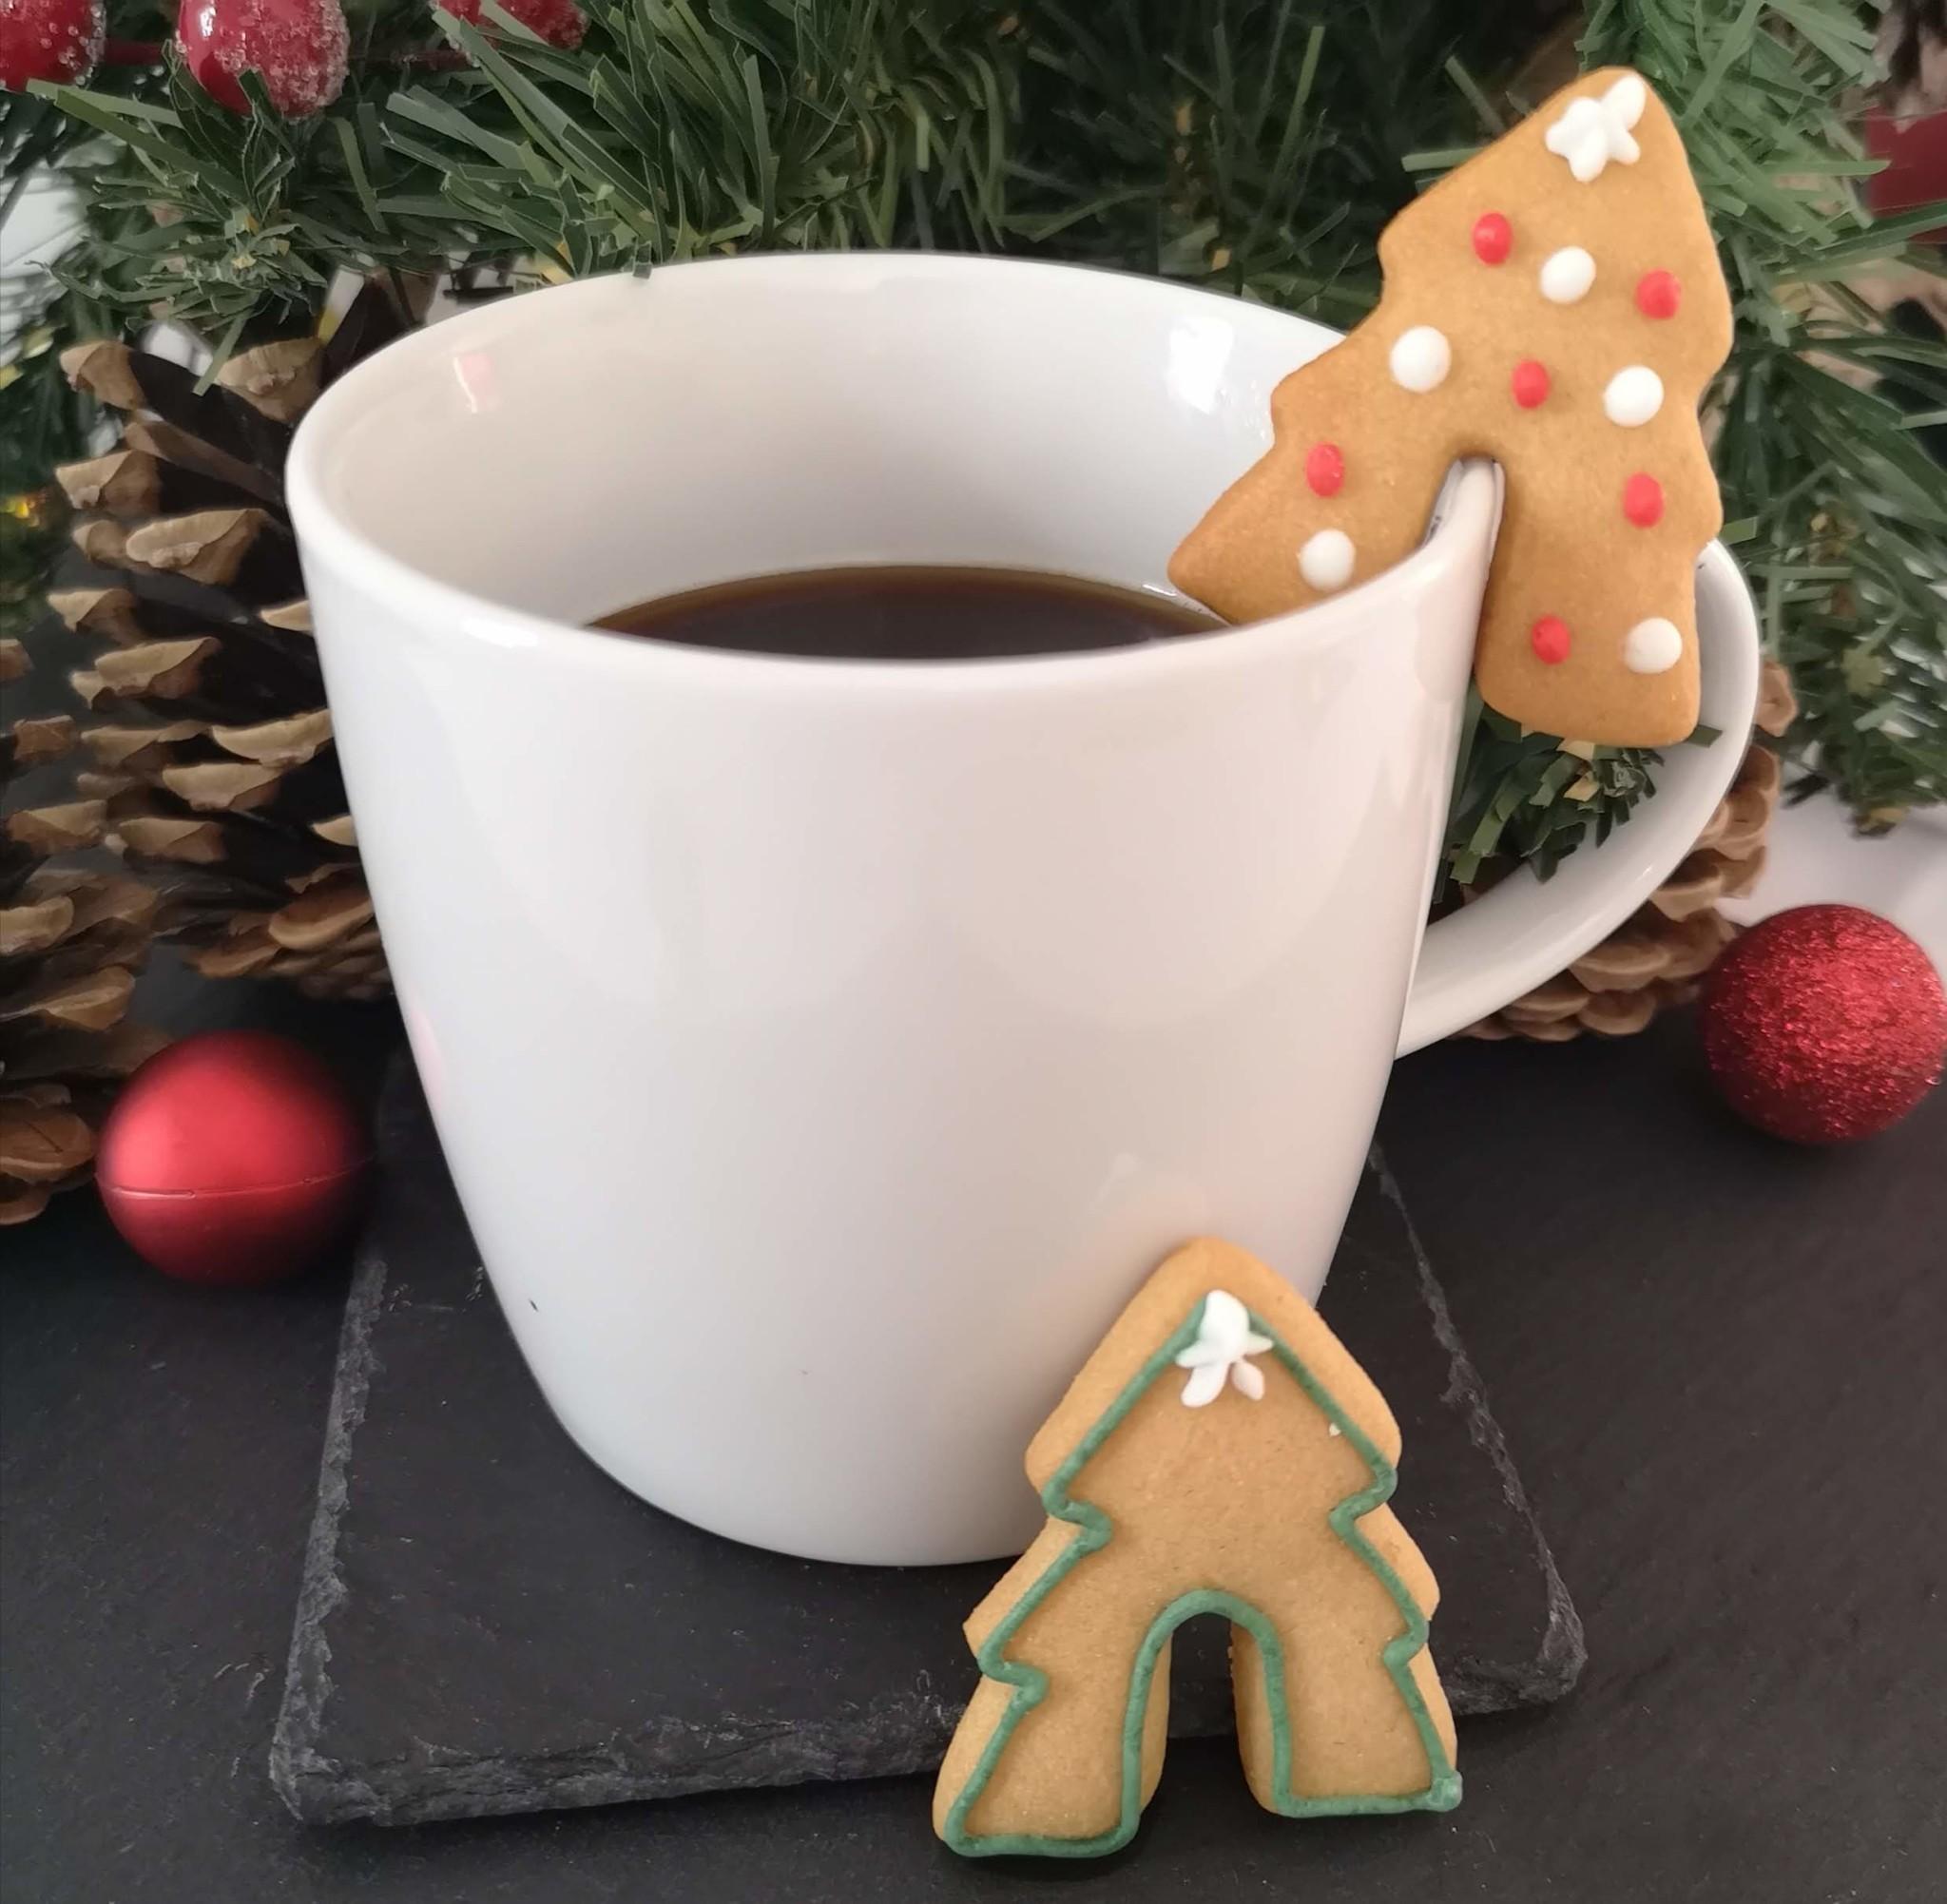 Weddell & Turner - Gingerbread Mug Hugs